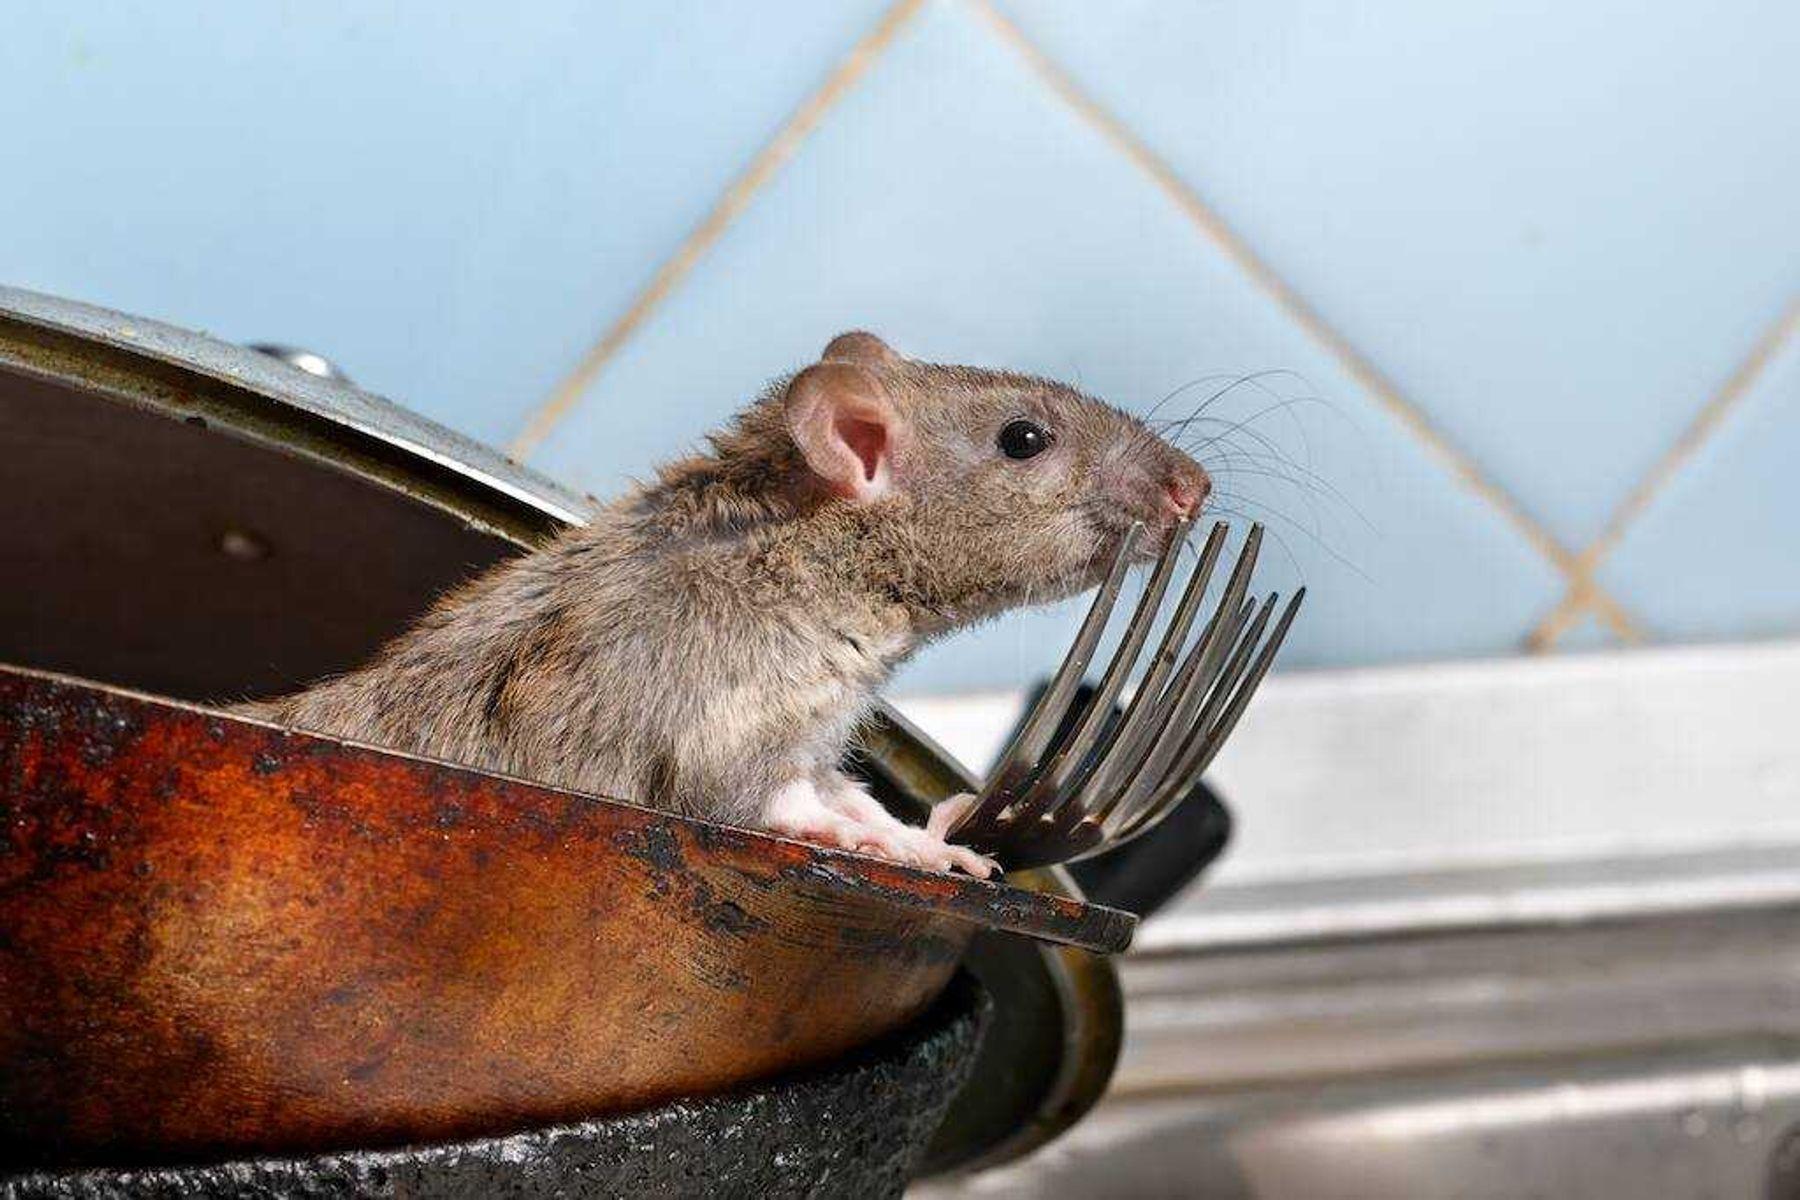 rato-cinza-dentro-de-uma-panela